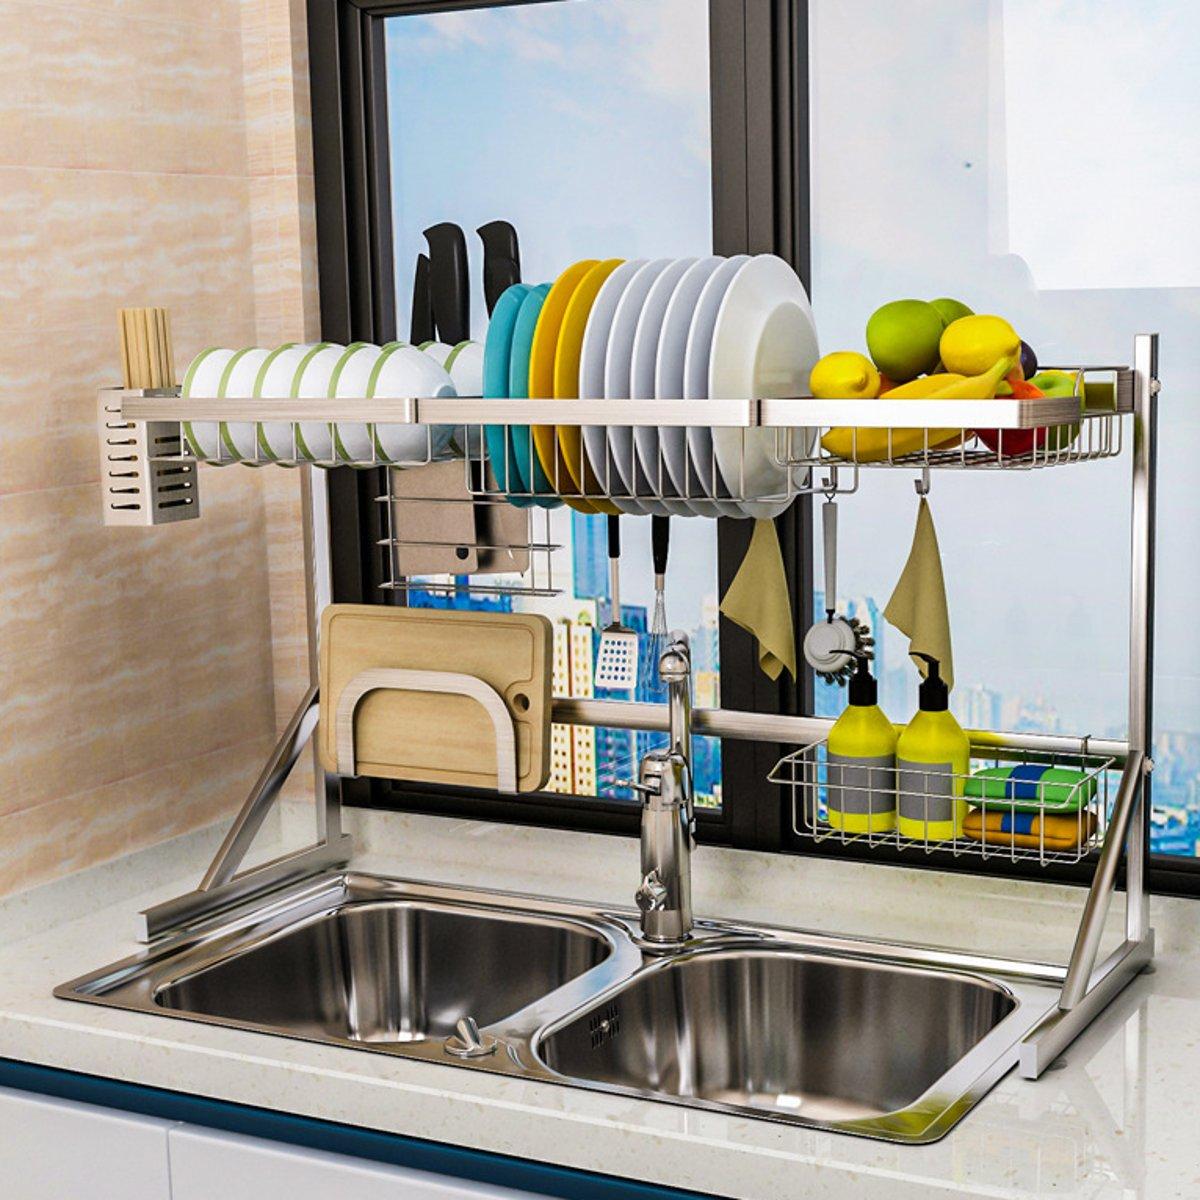 2 Layers Multi-use Stainless Steel Dishes Rack Single Dual Sink Drain Rack Kitchen Oragnizer Rack Dish Shelf Sink Drying Rack